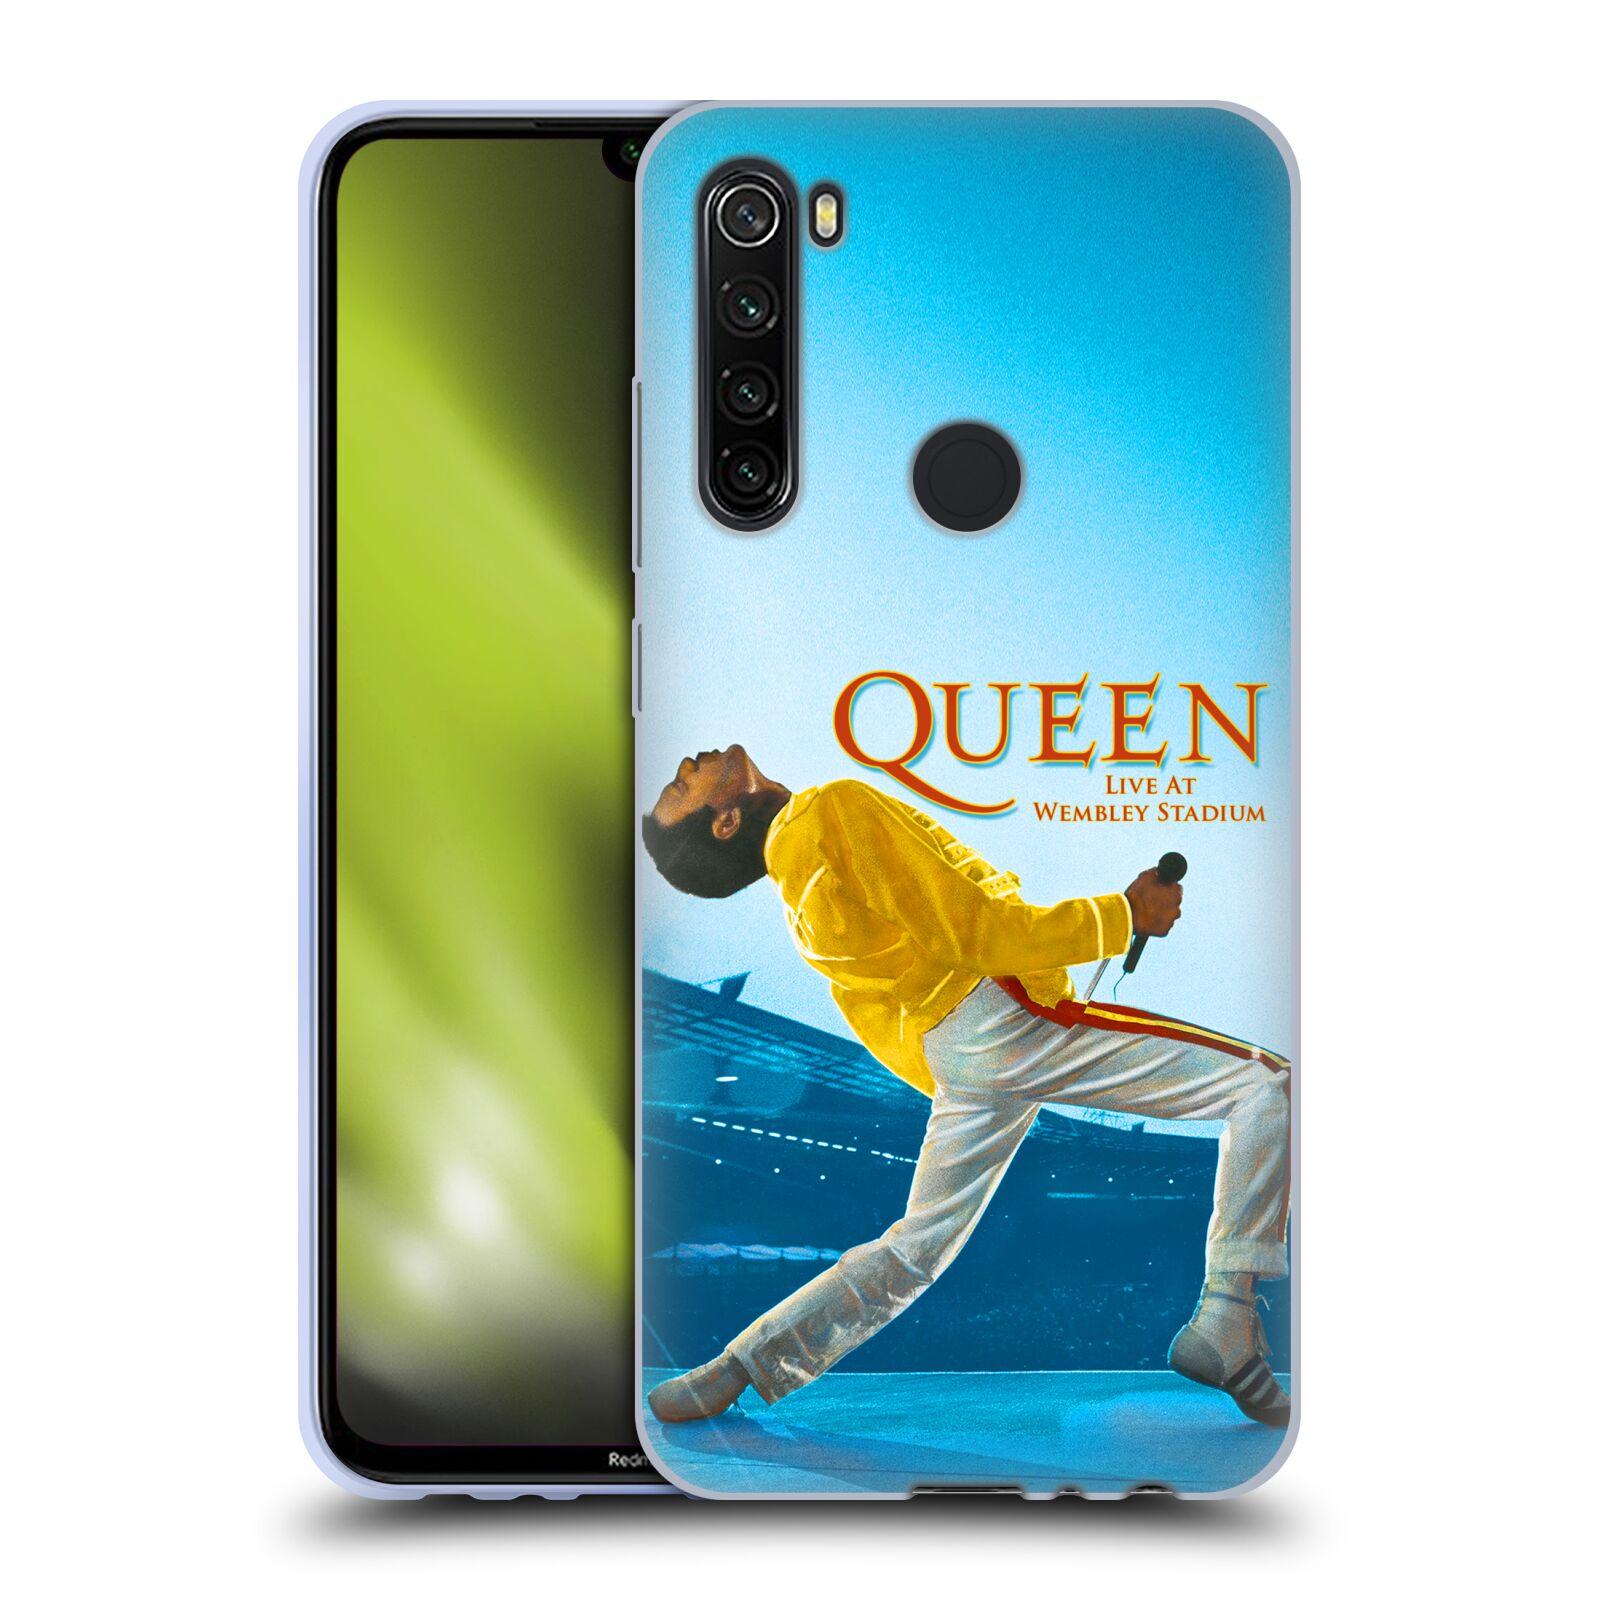 Silikonové pouzdro na mobil Xiaomi Redmi Note 8T - Head Case - Queen - Freddie Mercury